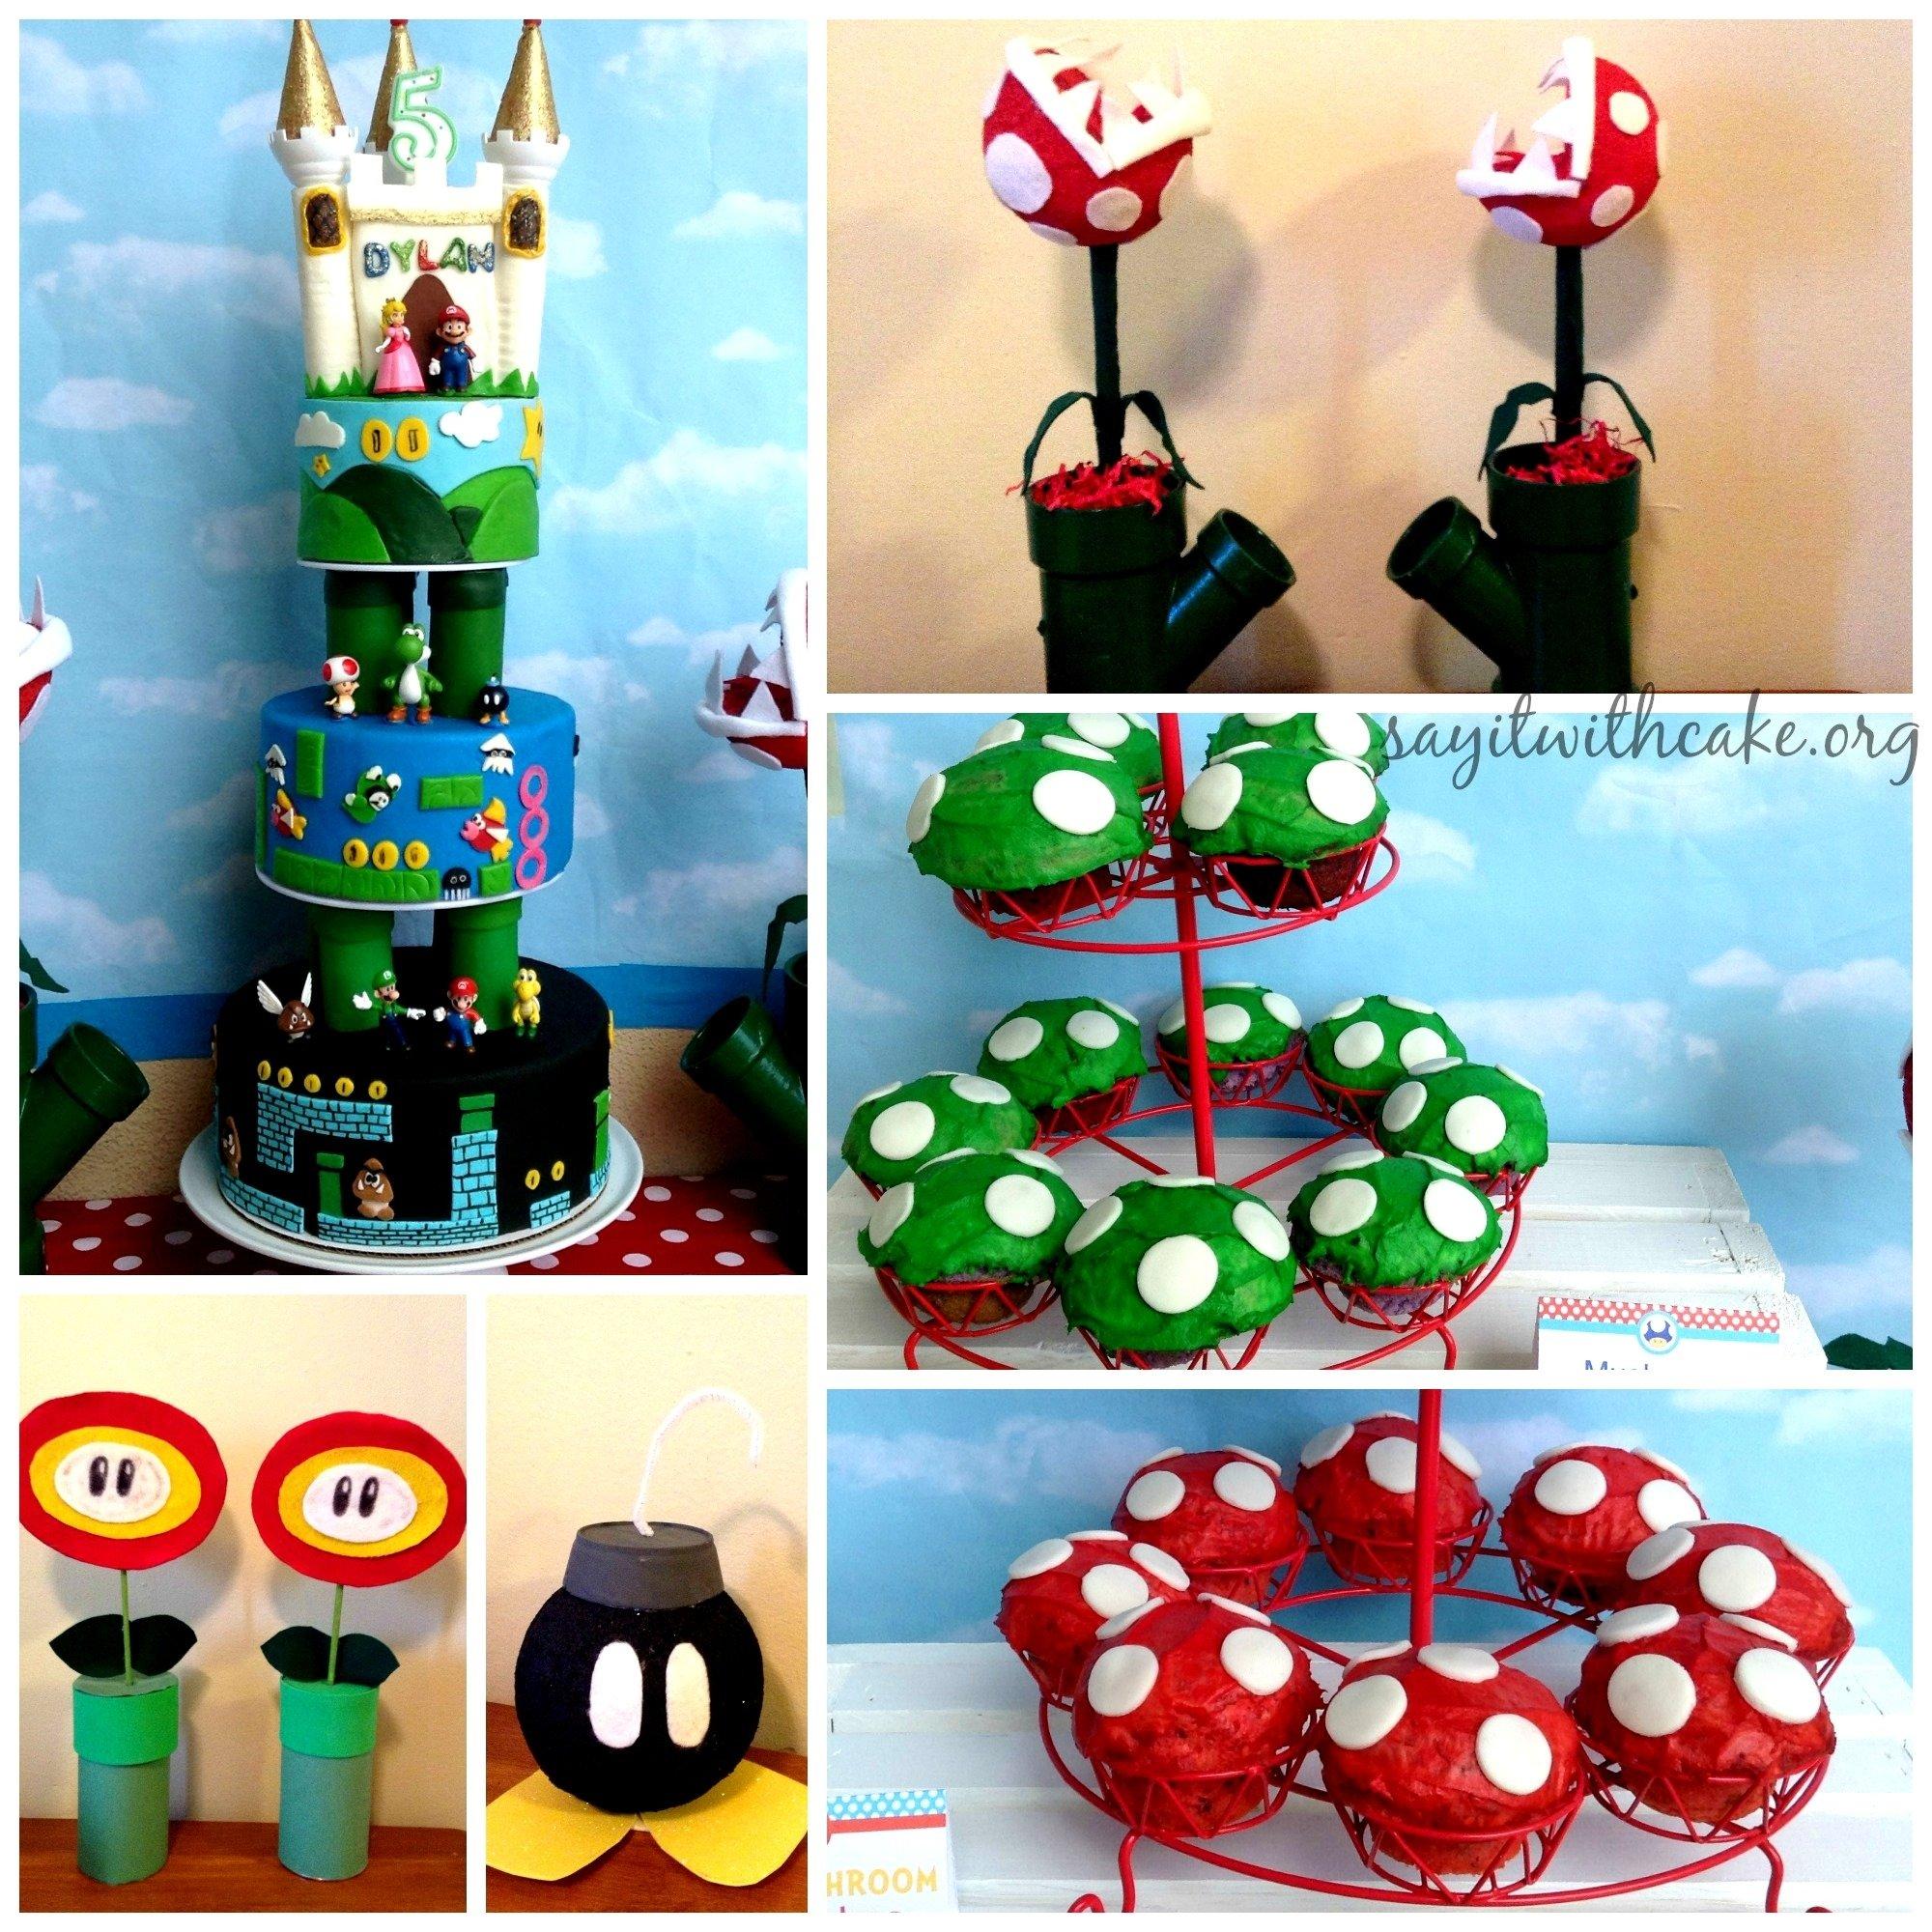 10 Famous Super Mario Bros Party Ideas super mario bros party say it with cake 2021